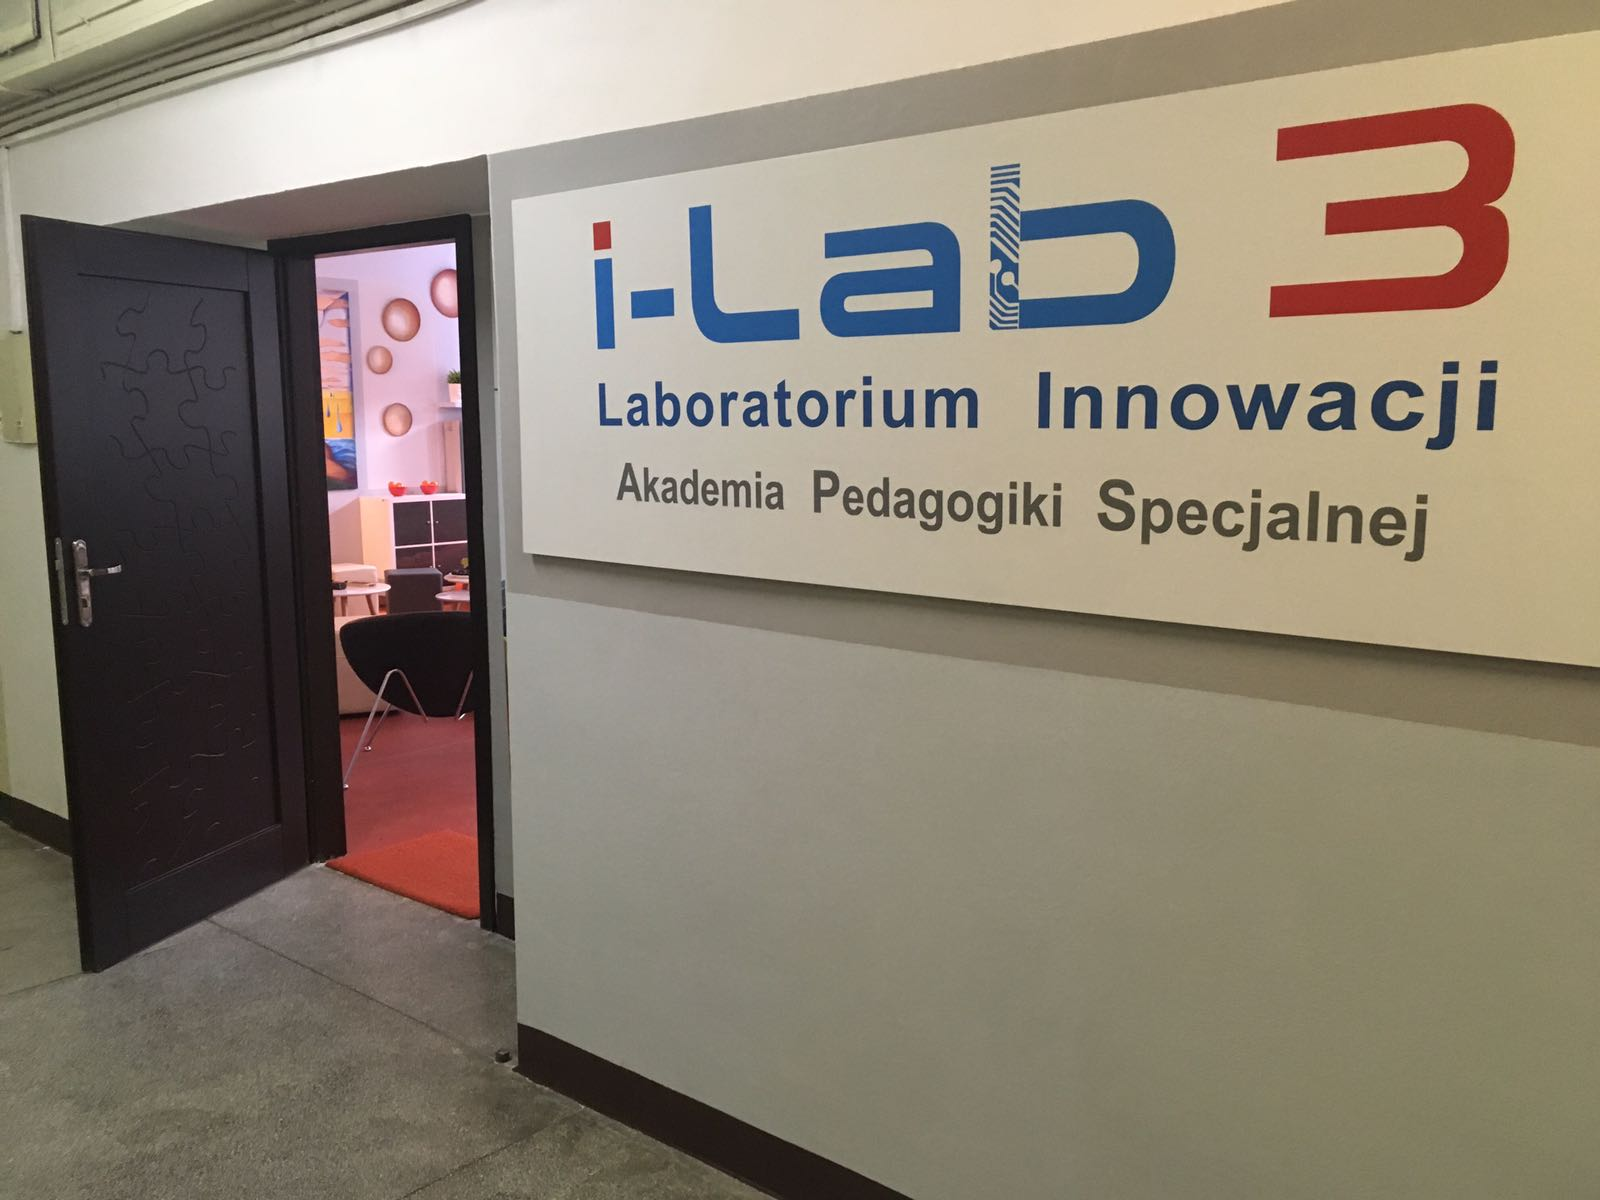 ILAB-3: VI° meeting a Varsavia